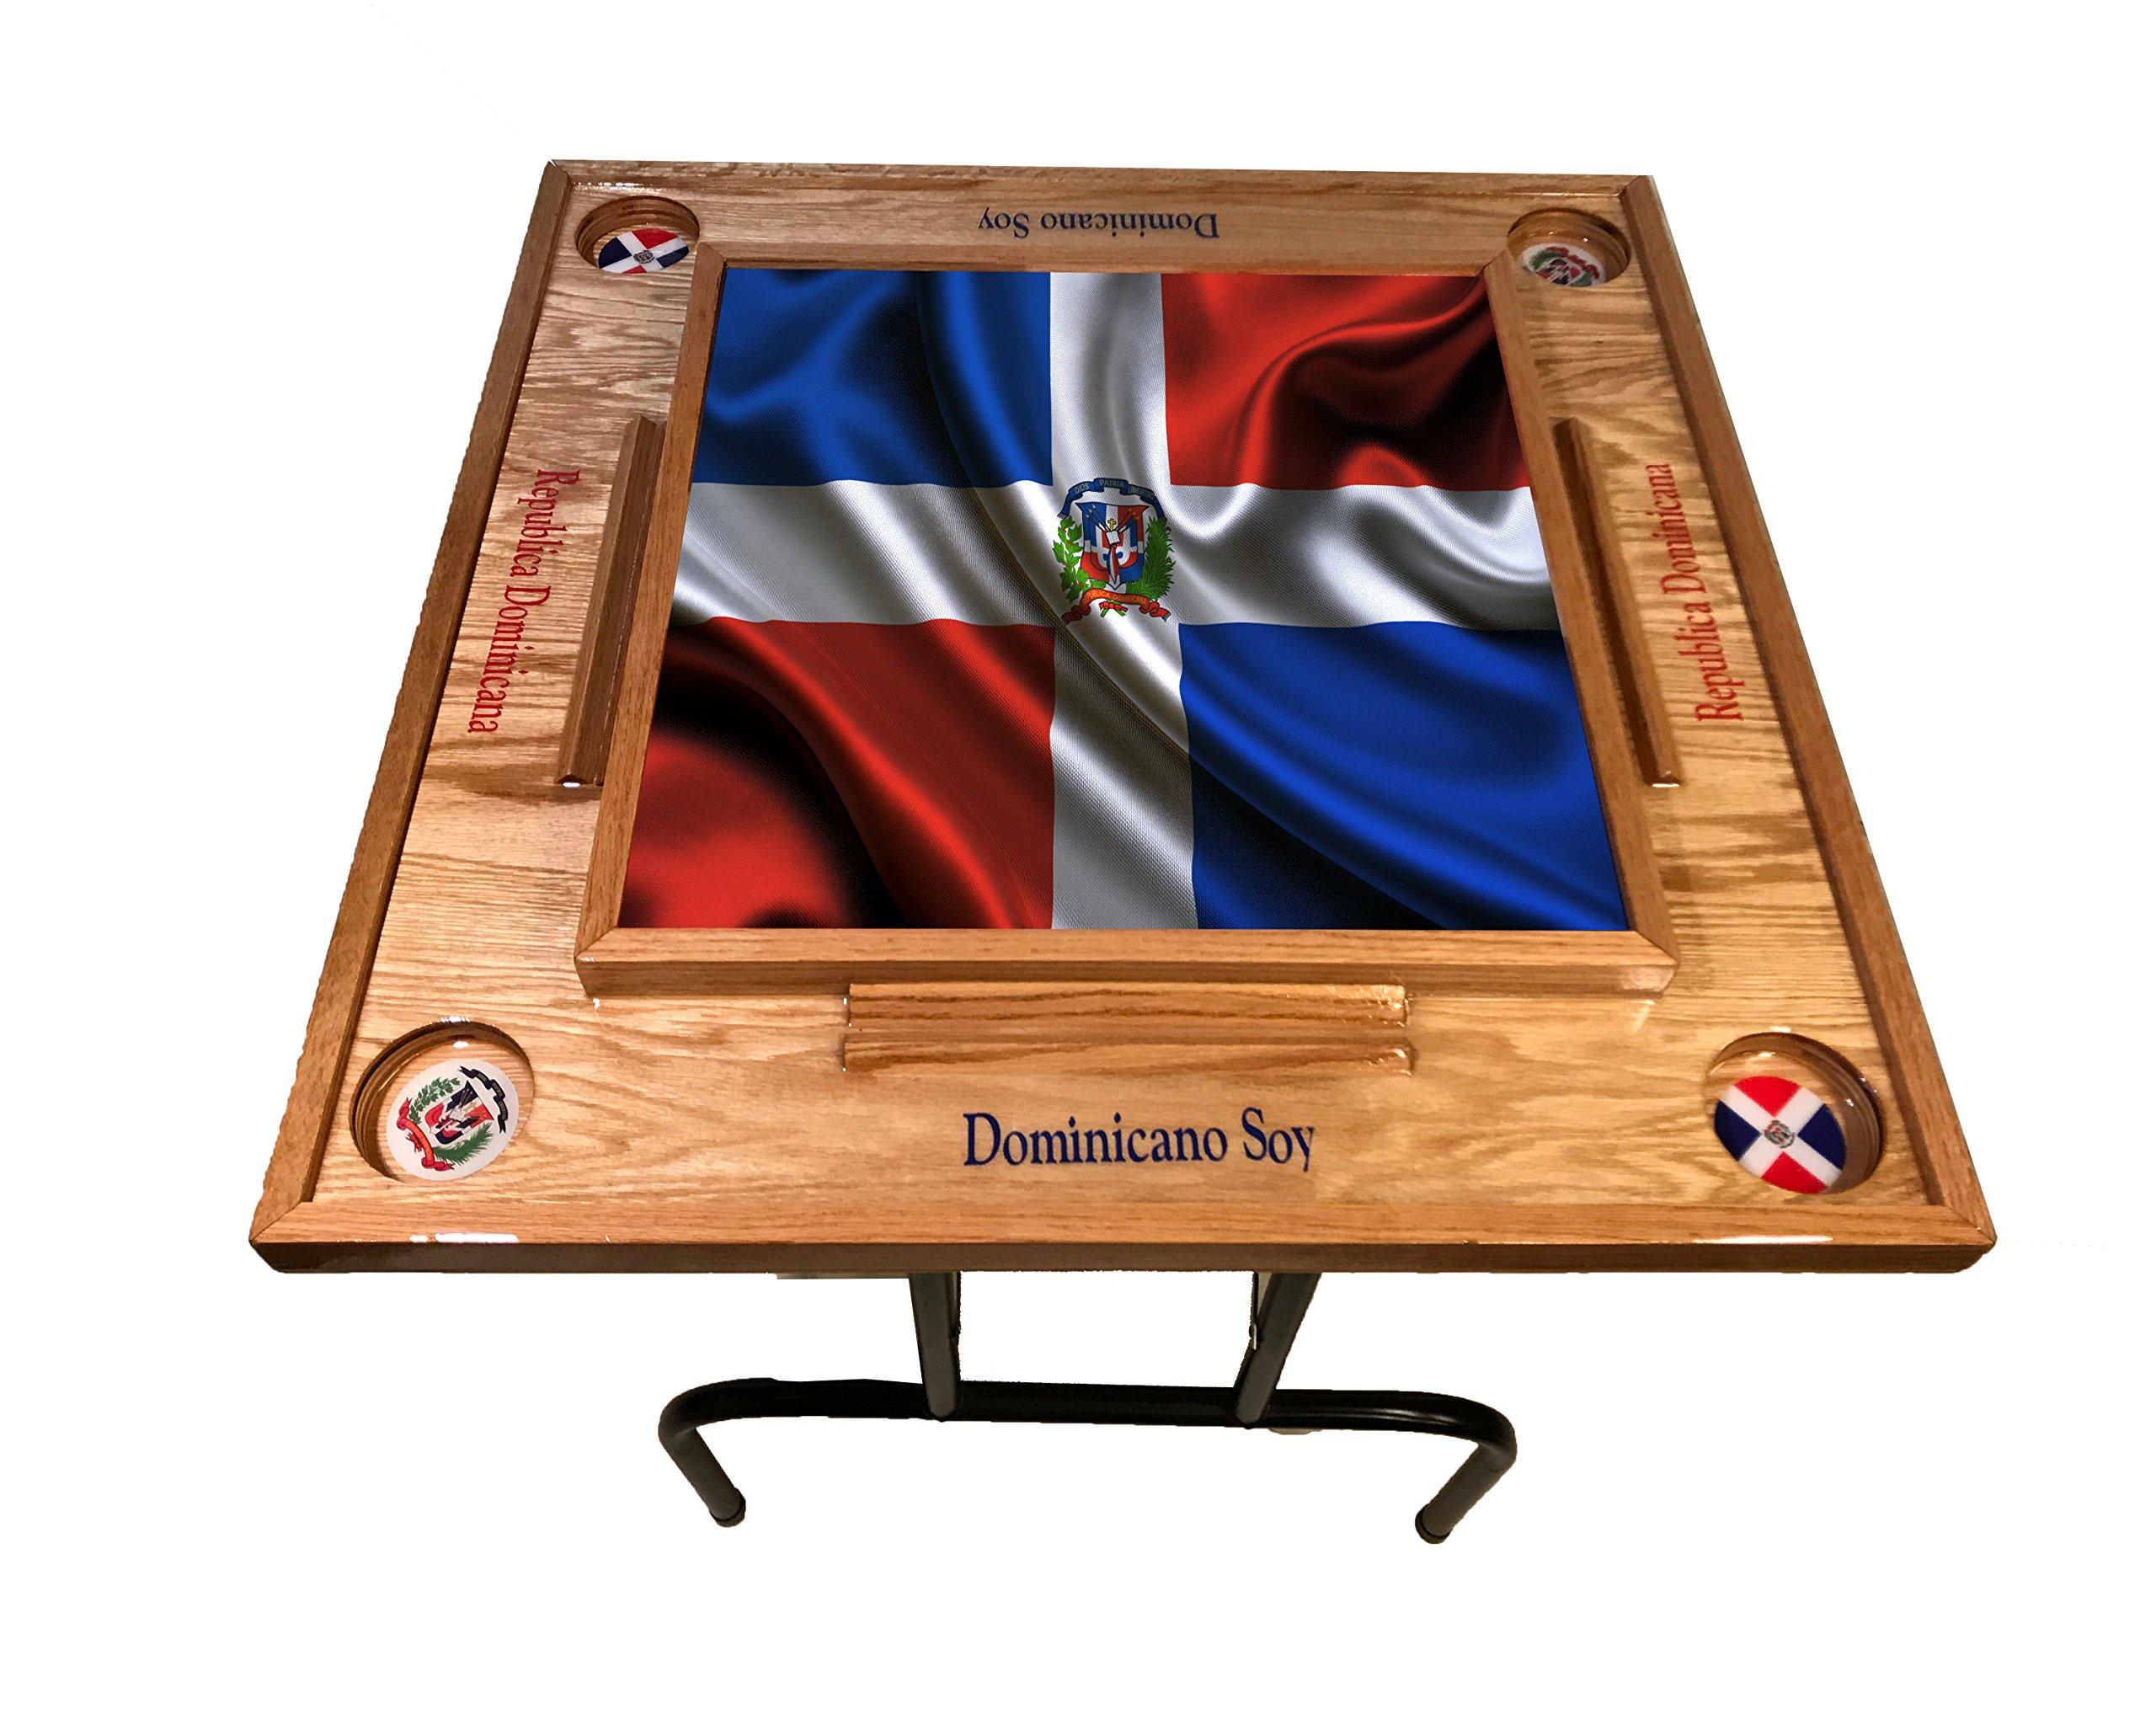 latinos r us Dominican Republic w Full Falg Domino Table (Natura)